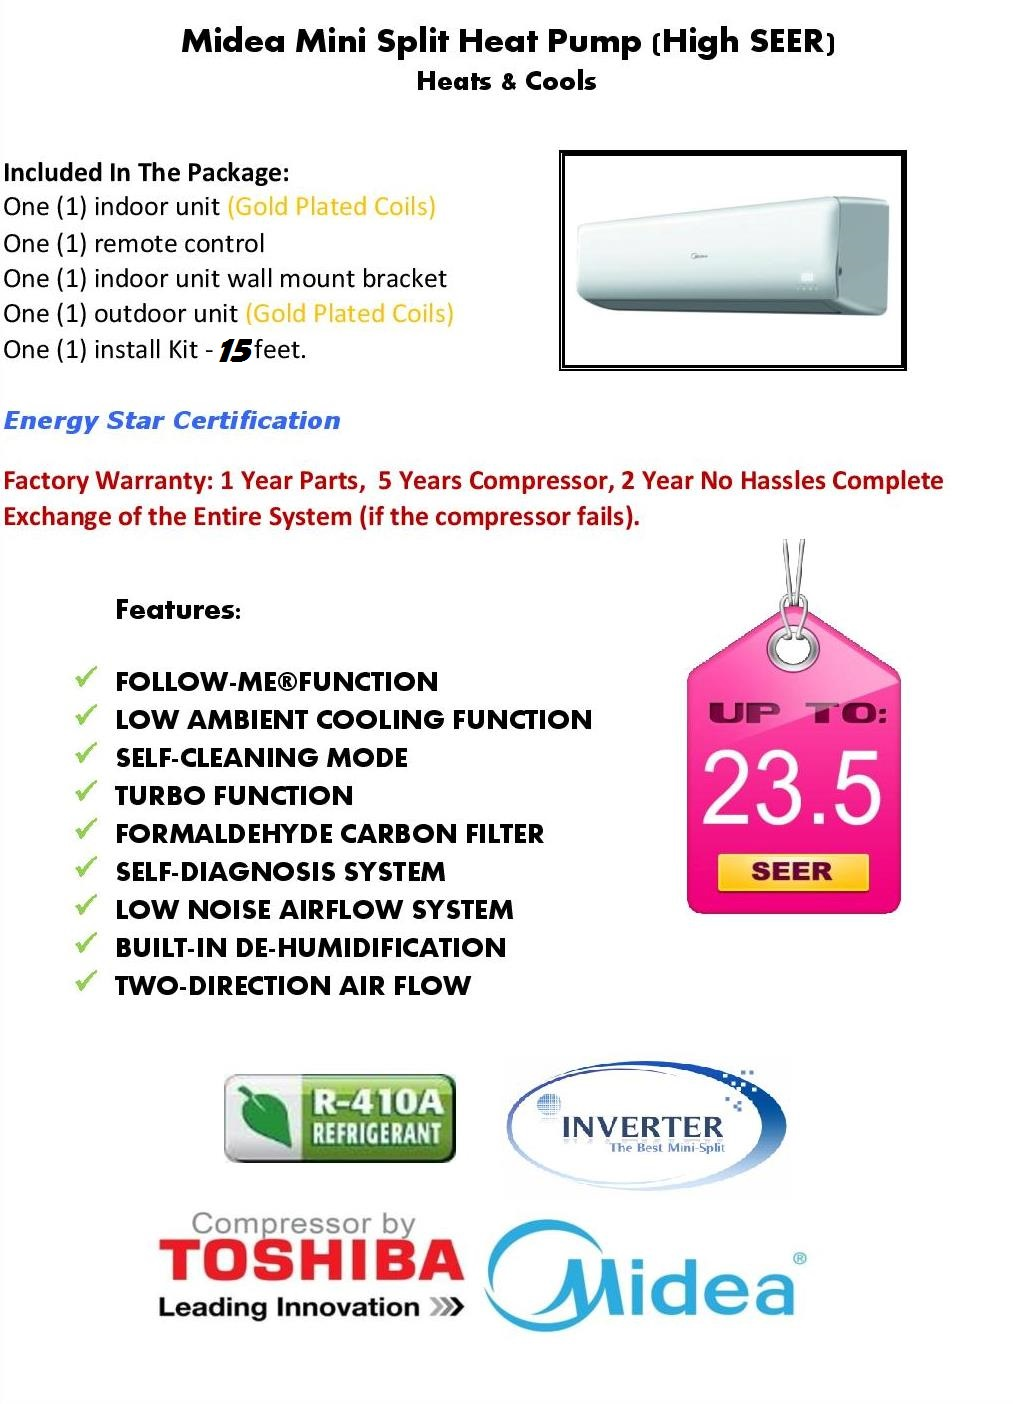 Get a Midea 24000 Btu 19 SEER Super Inverter Mini Split Heat Pump AC.  Price: $1,498.00 ex. tax